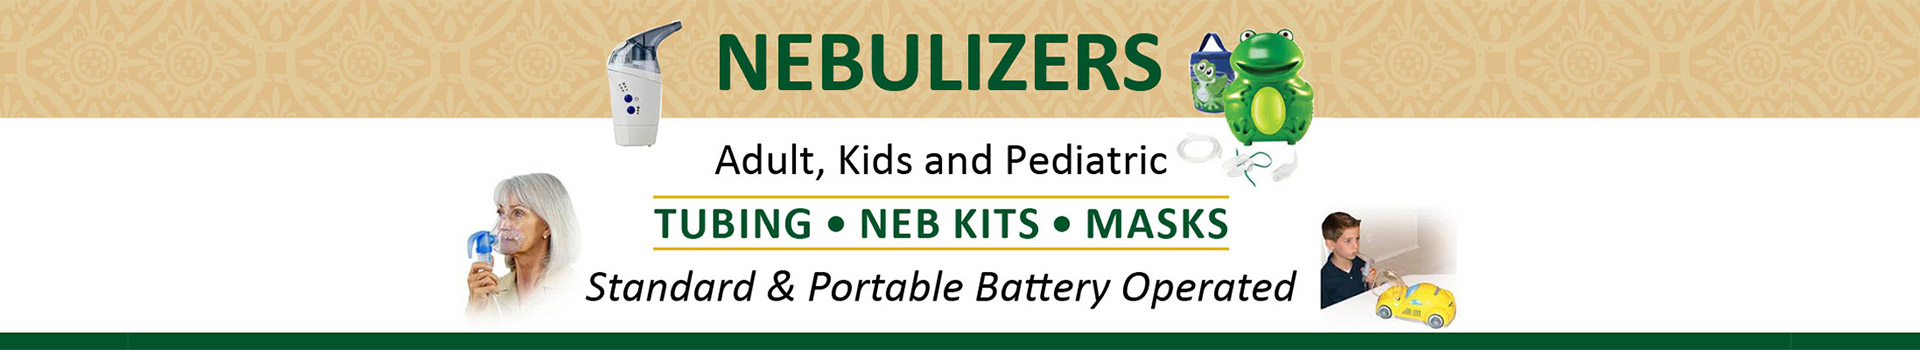 nebulizers-banner